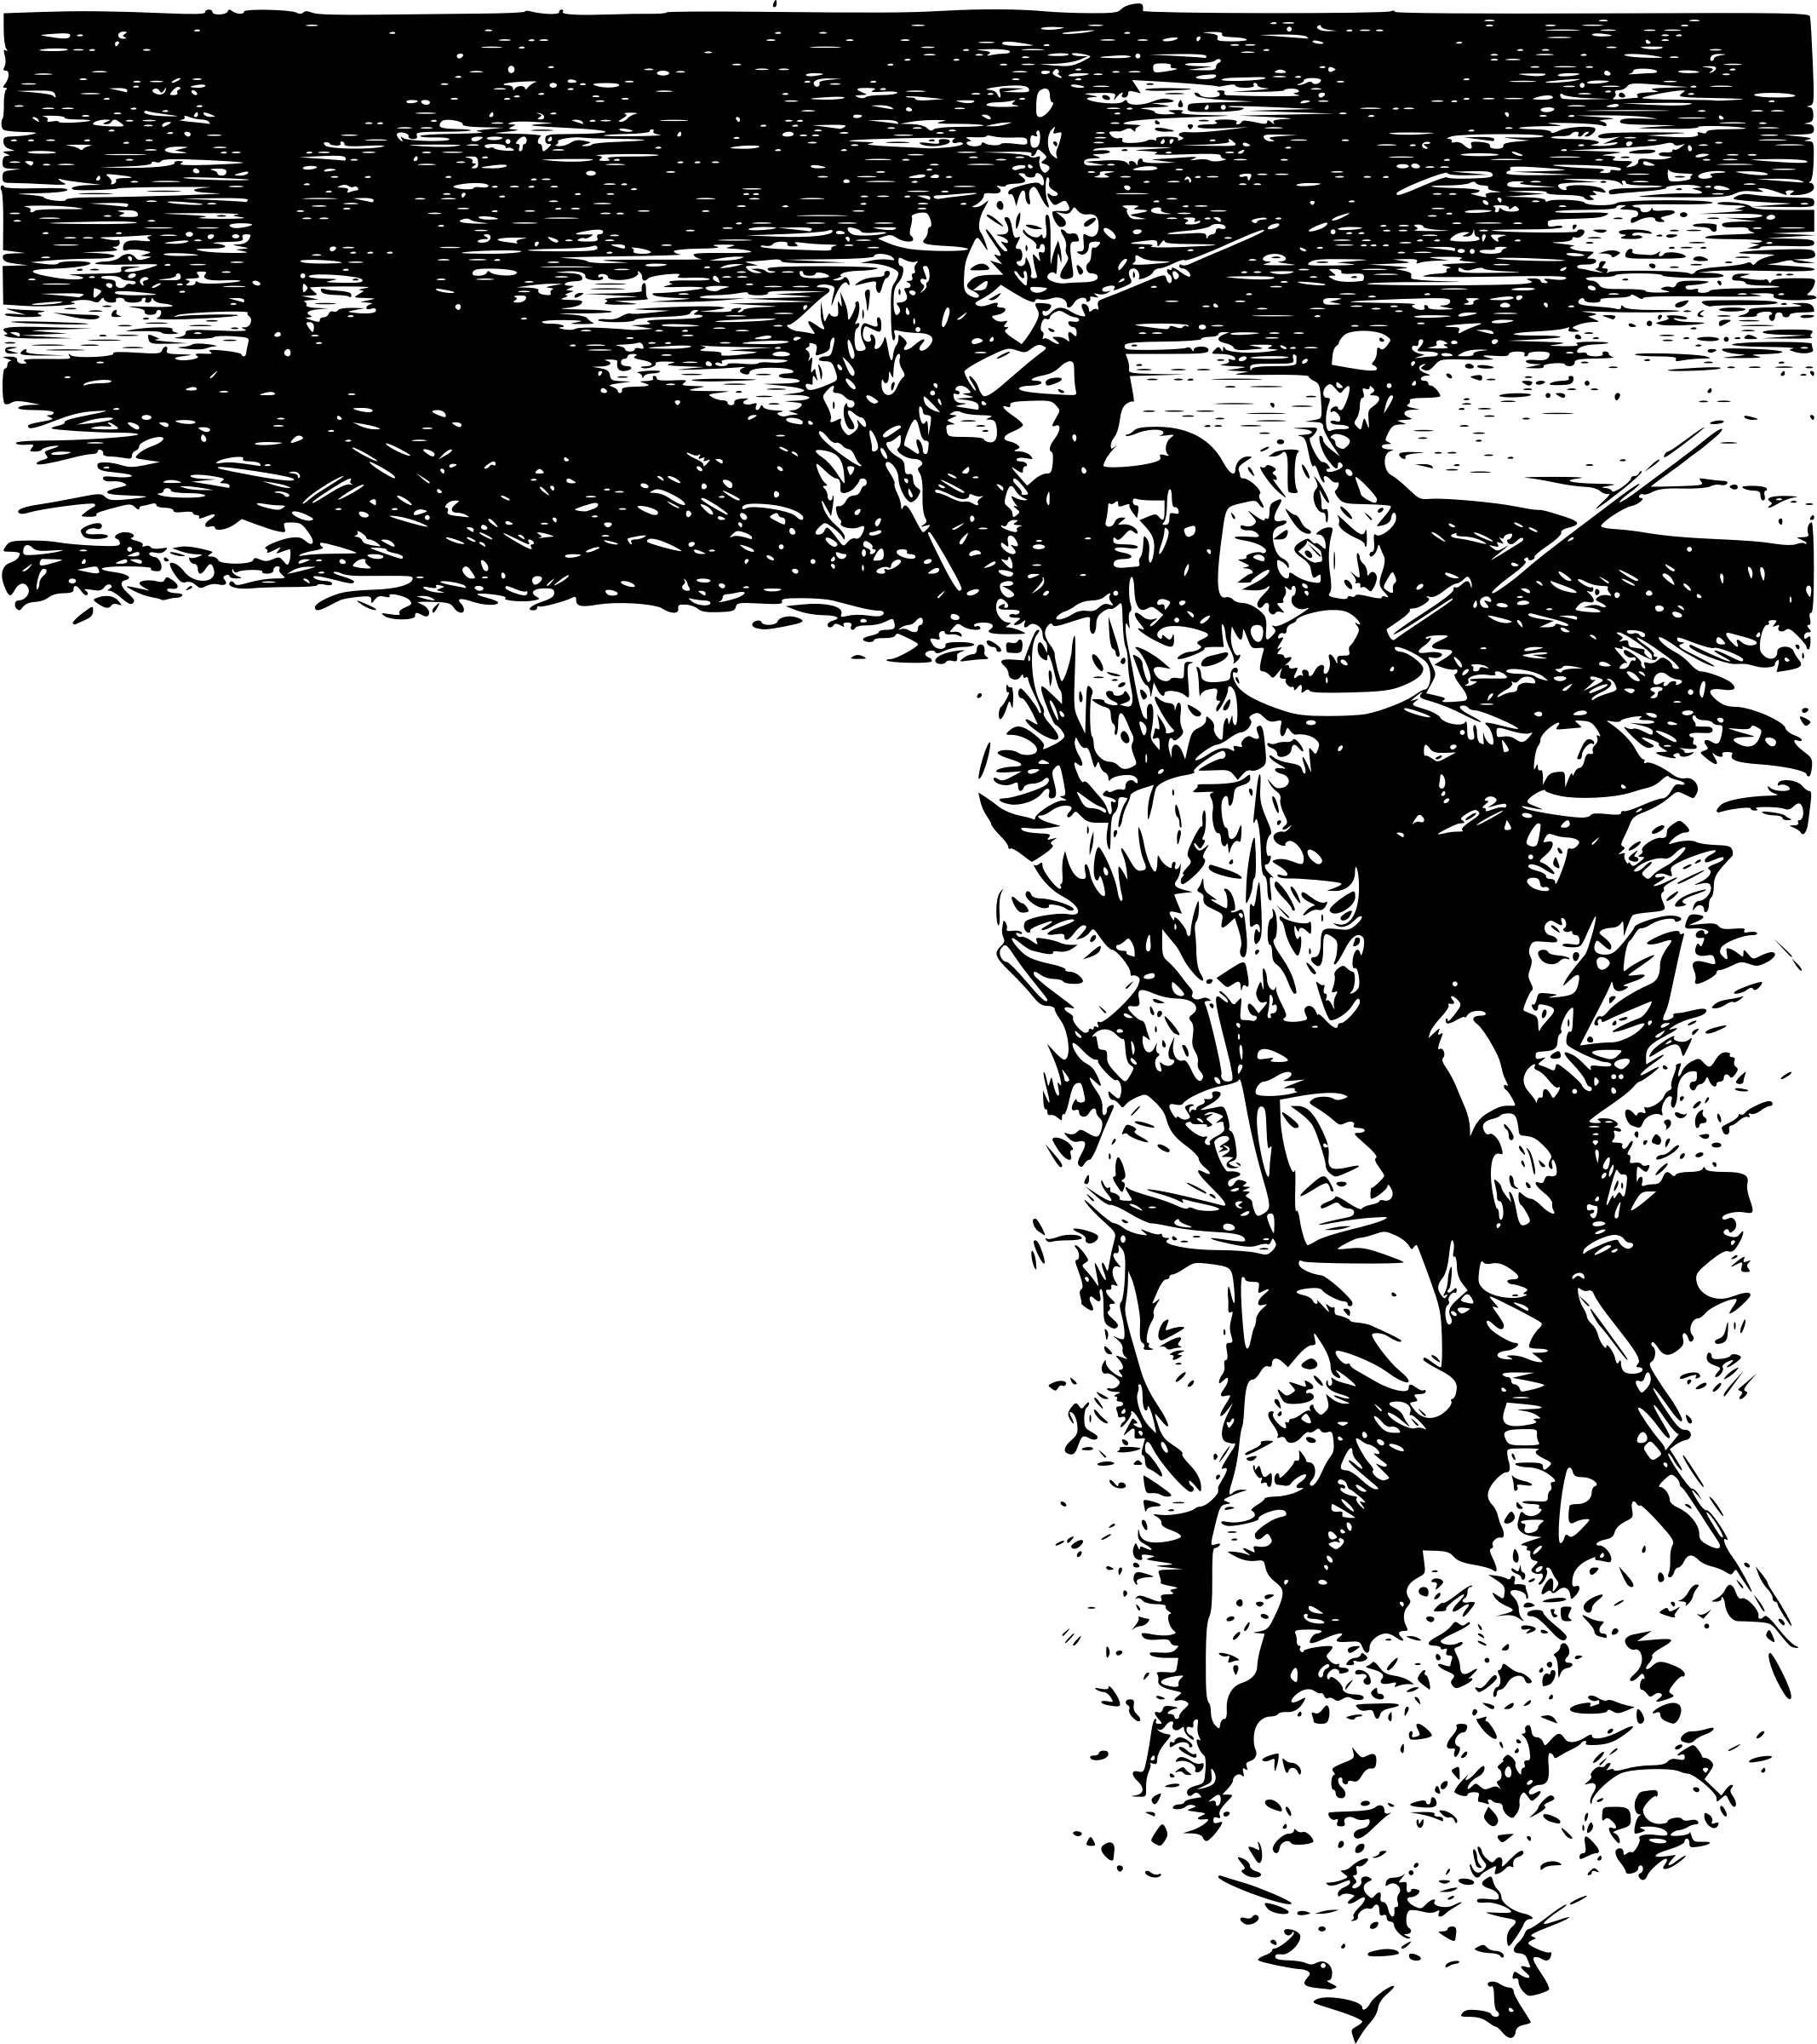 Hell Transparent Background SVG Clip arts